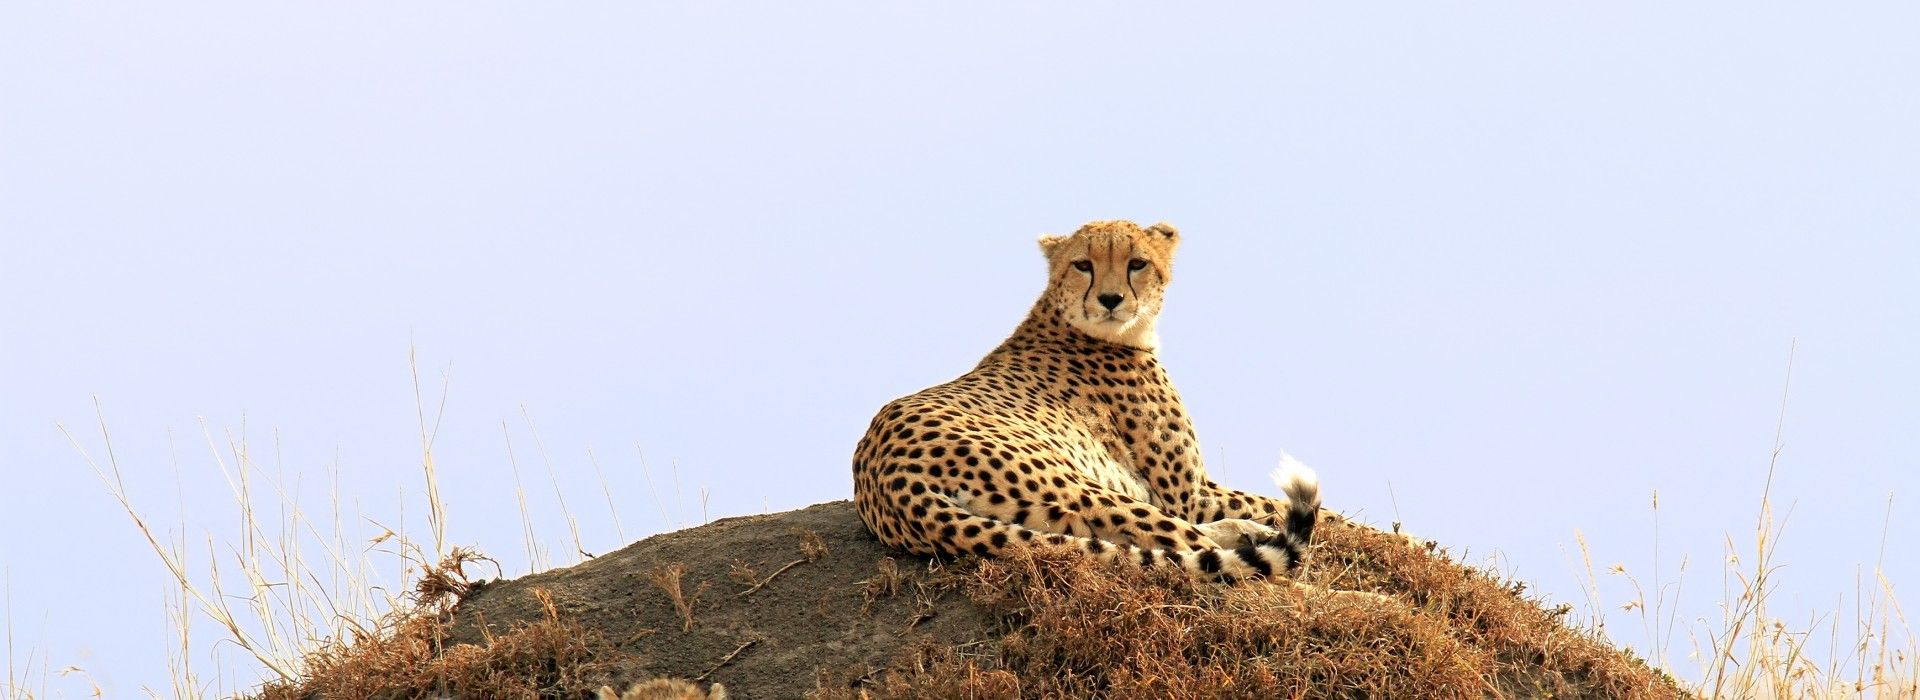 National parks Tours in Maasai Mara National Reserve